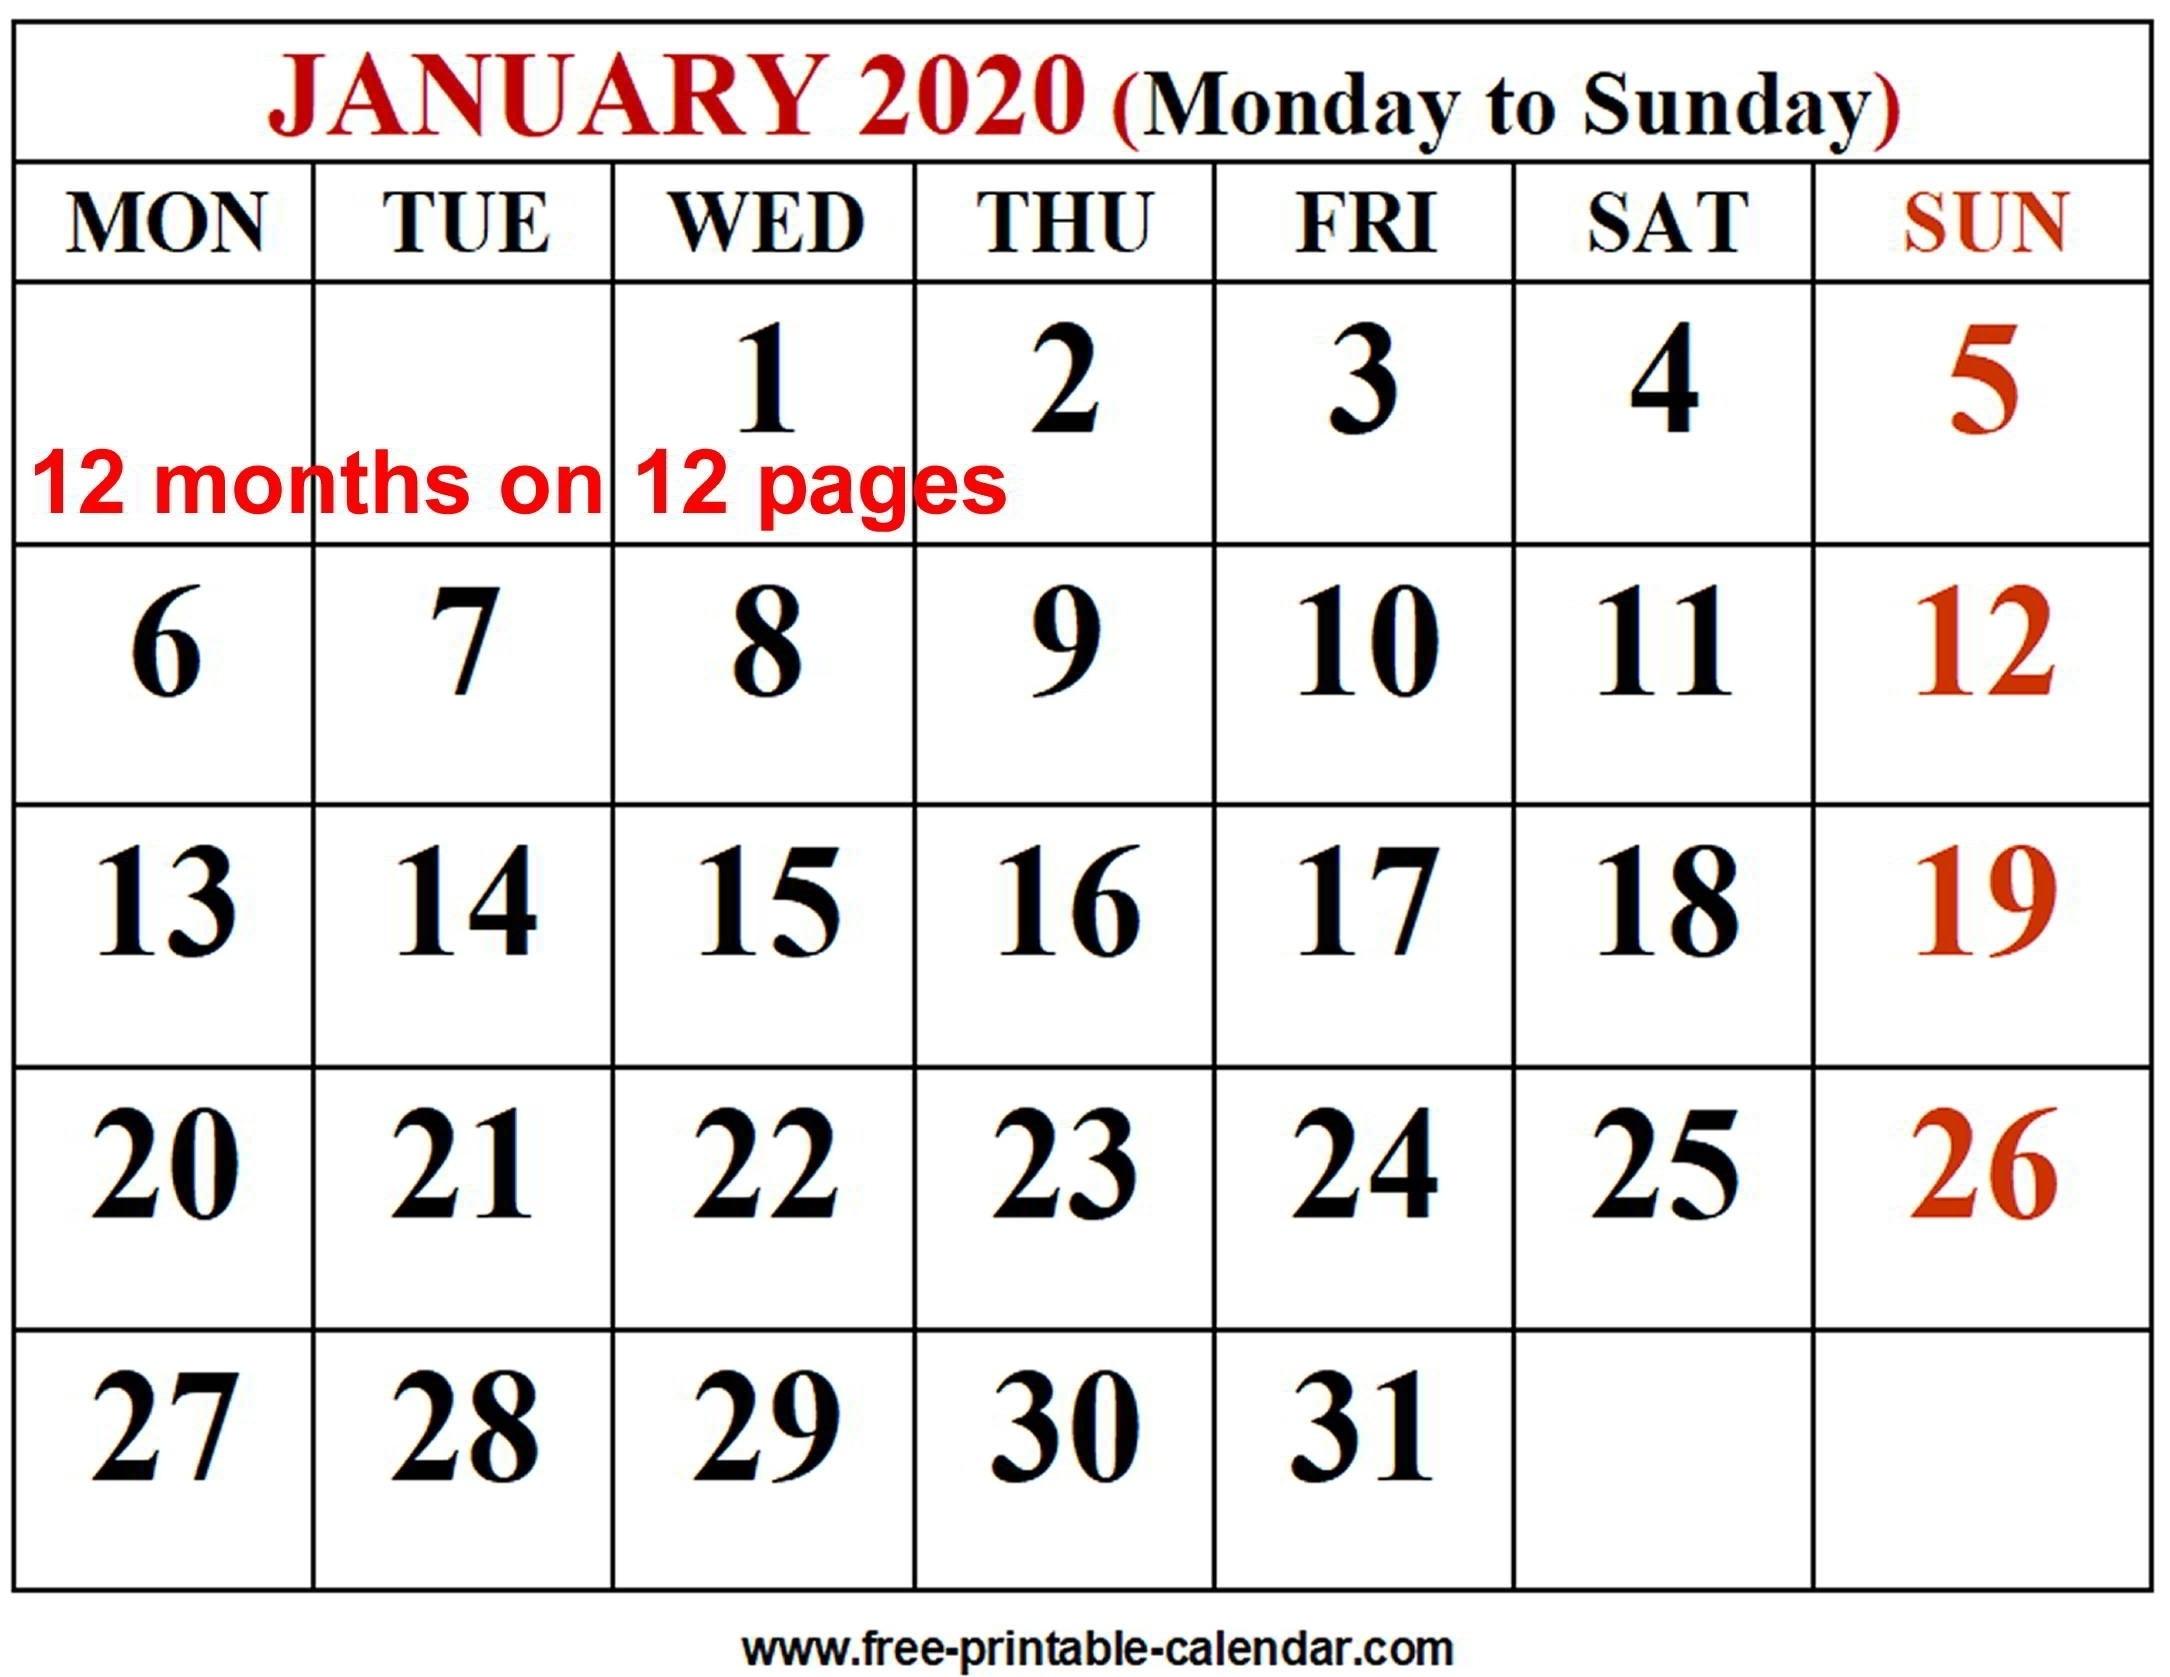 2020 Calendar Template – Free-Printable-Calendar-Monthly-Monthly Calendar Printable 2020 Portrait Monday Start